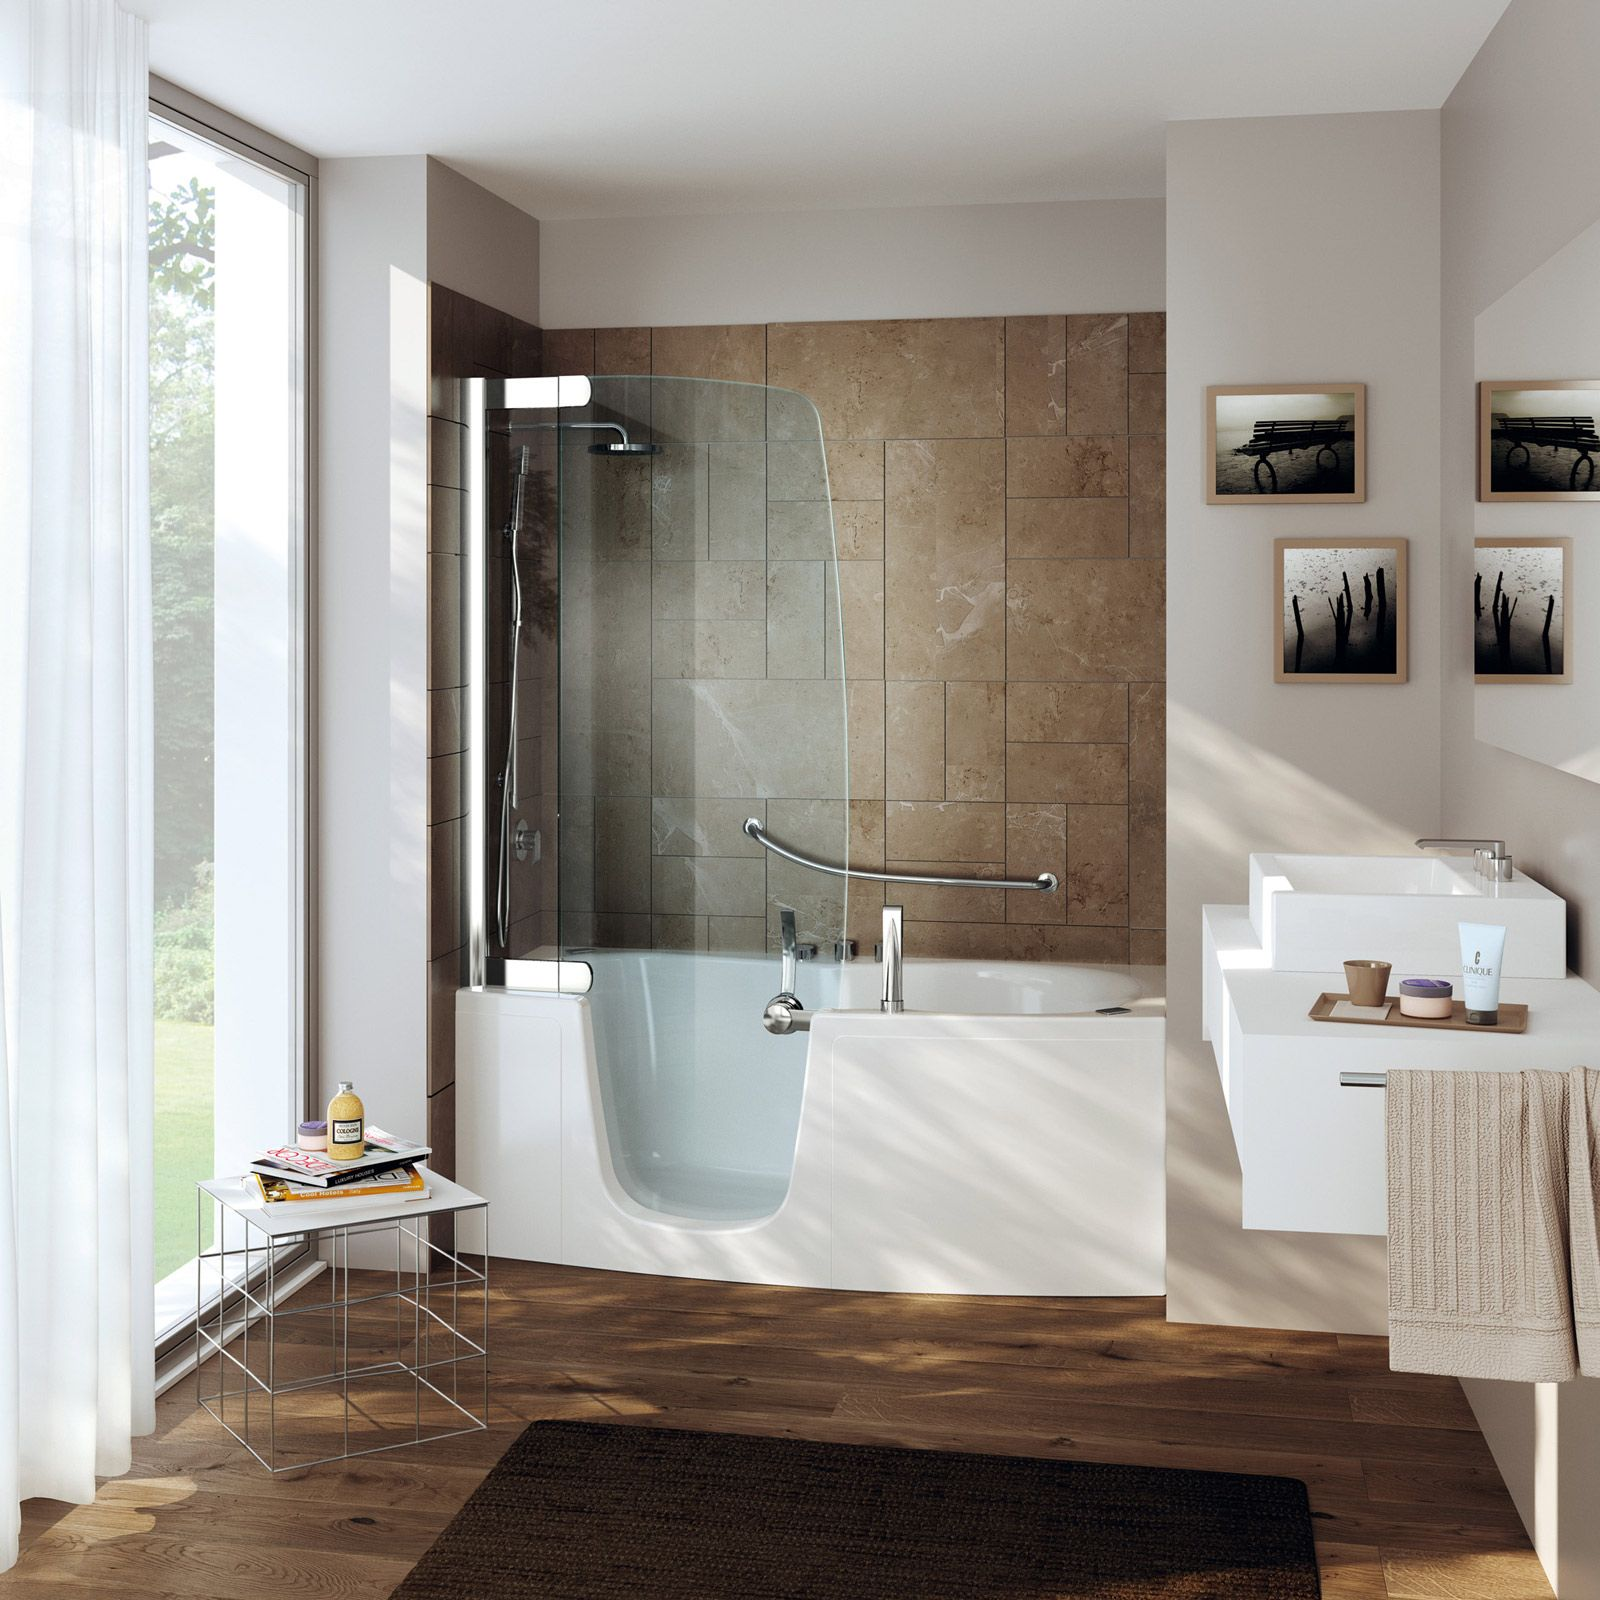 Vasca e doccia insieme vasca da bagno vasca da bagno for Casa moderna bagni